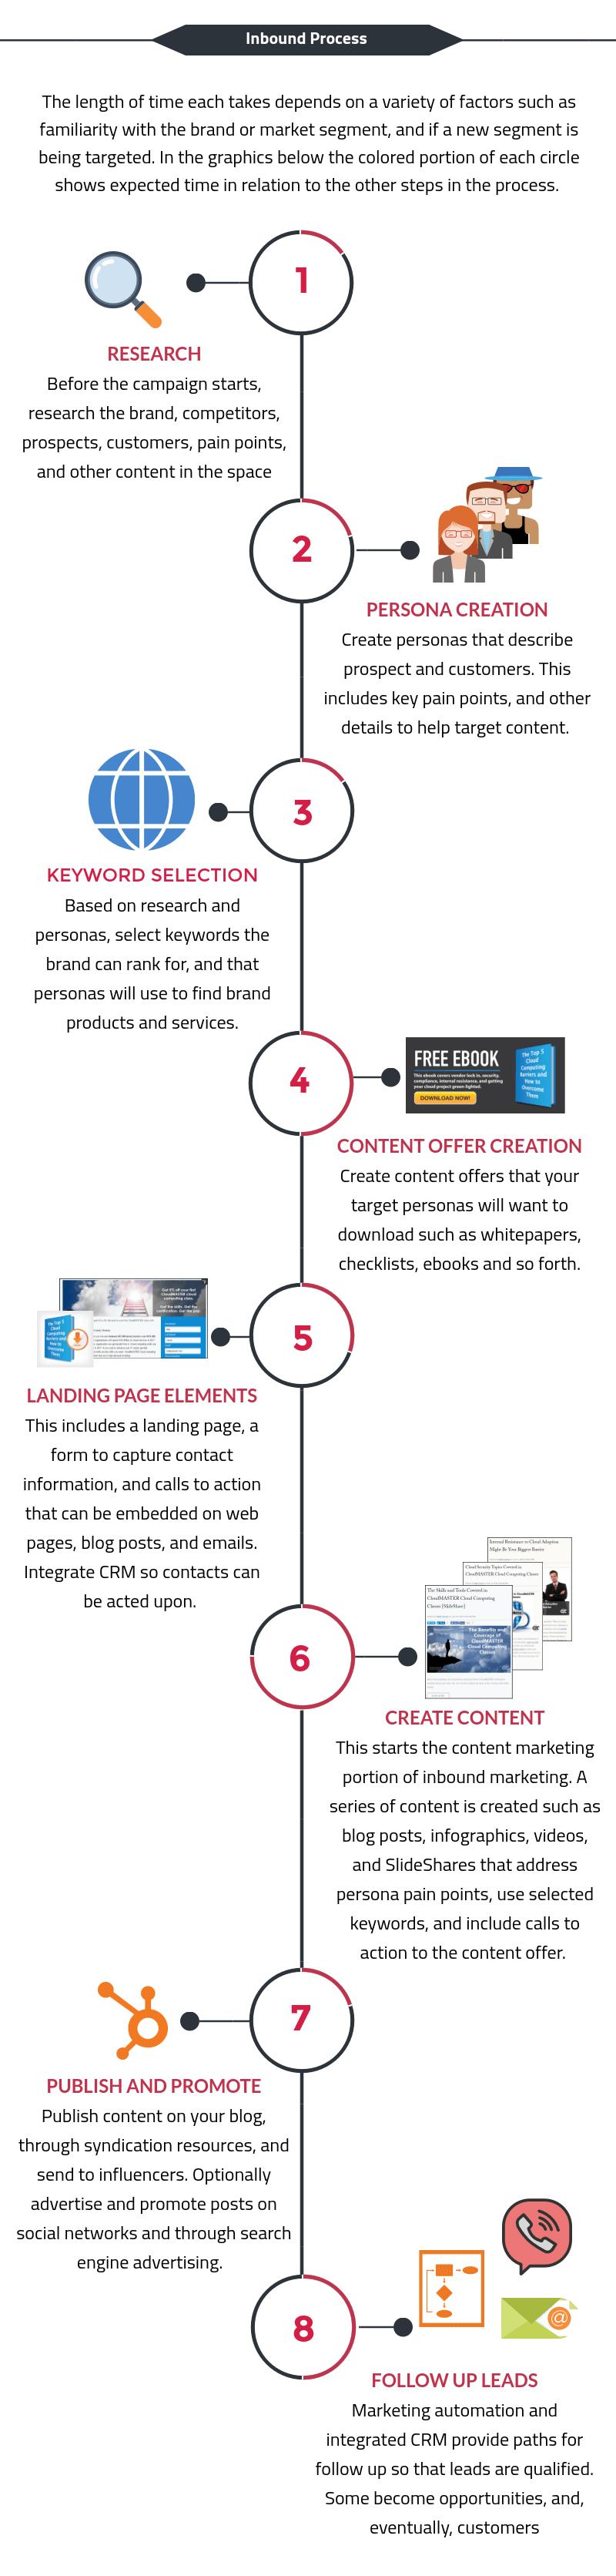 Inbound маркетинг инфографика